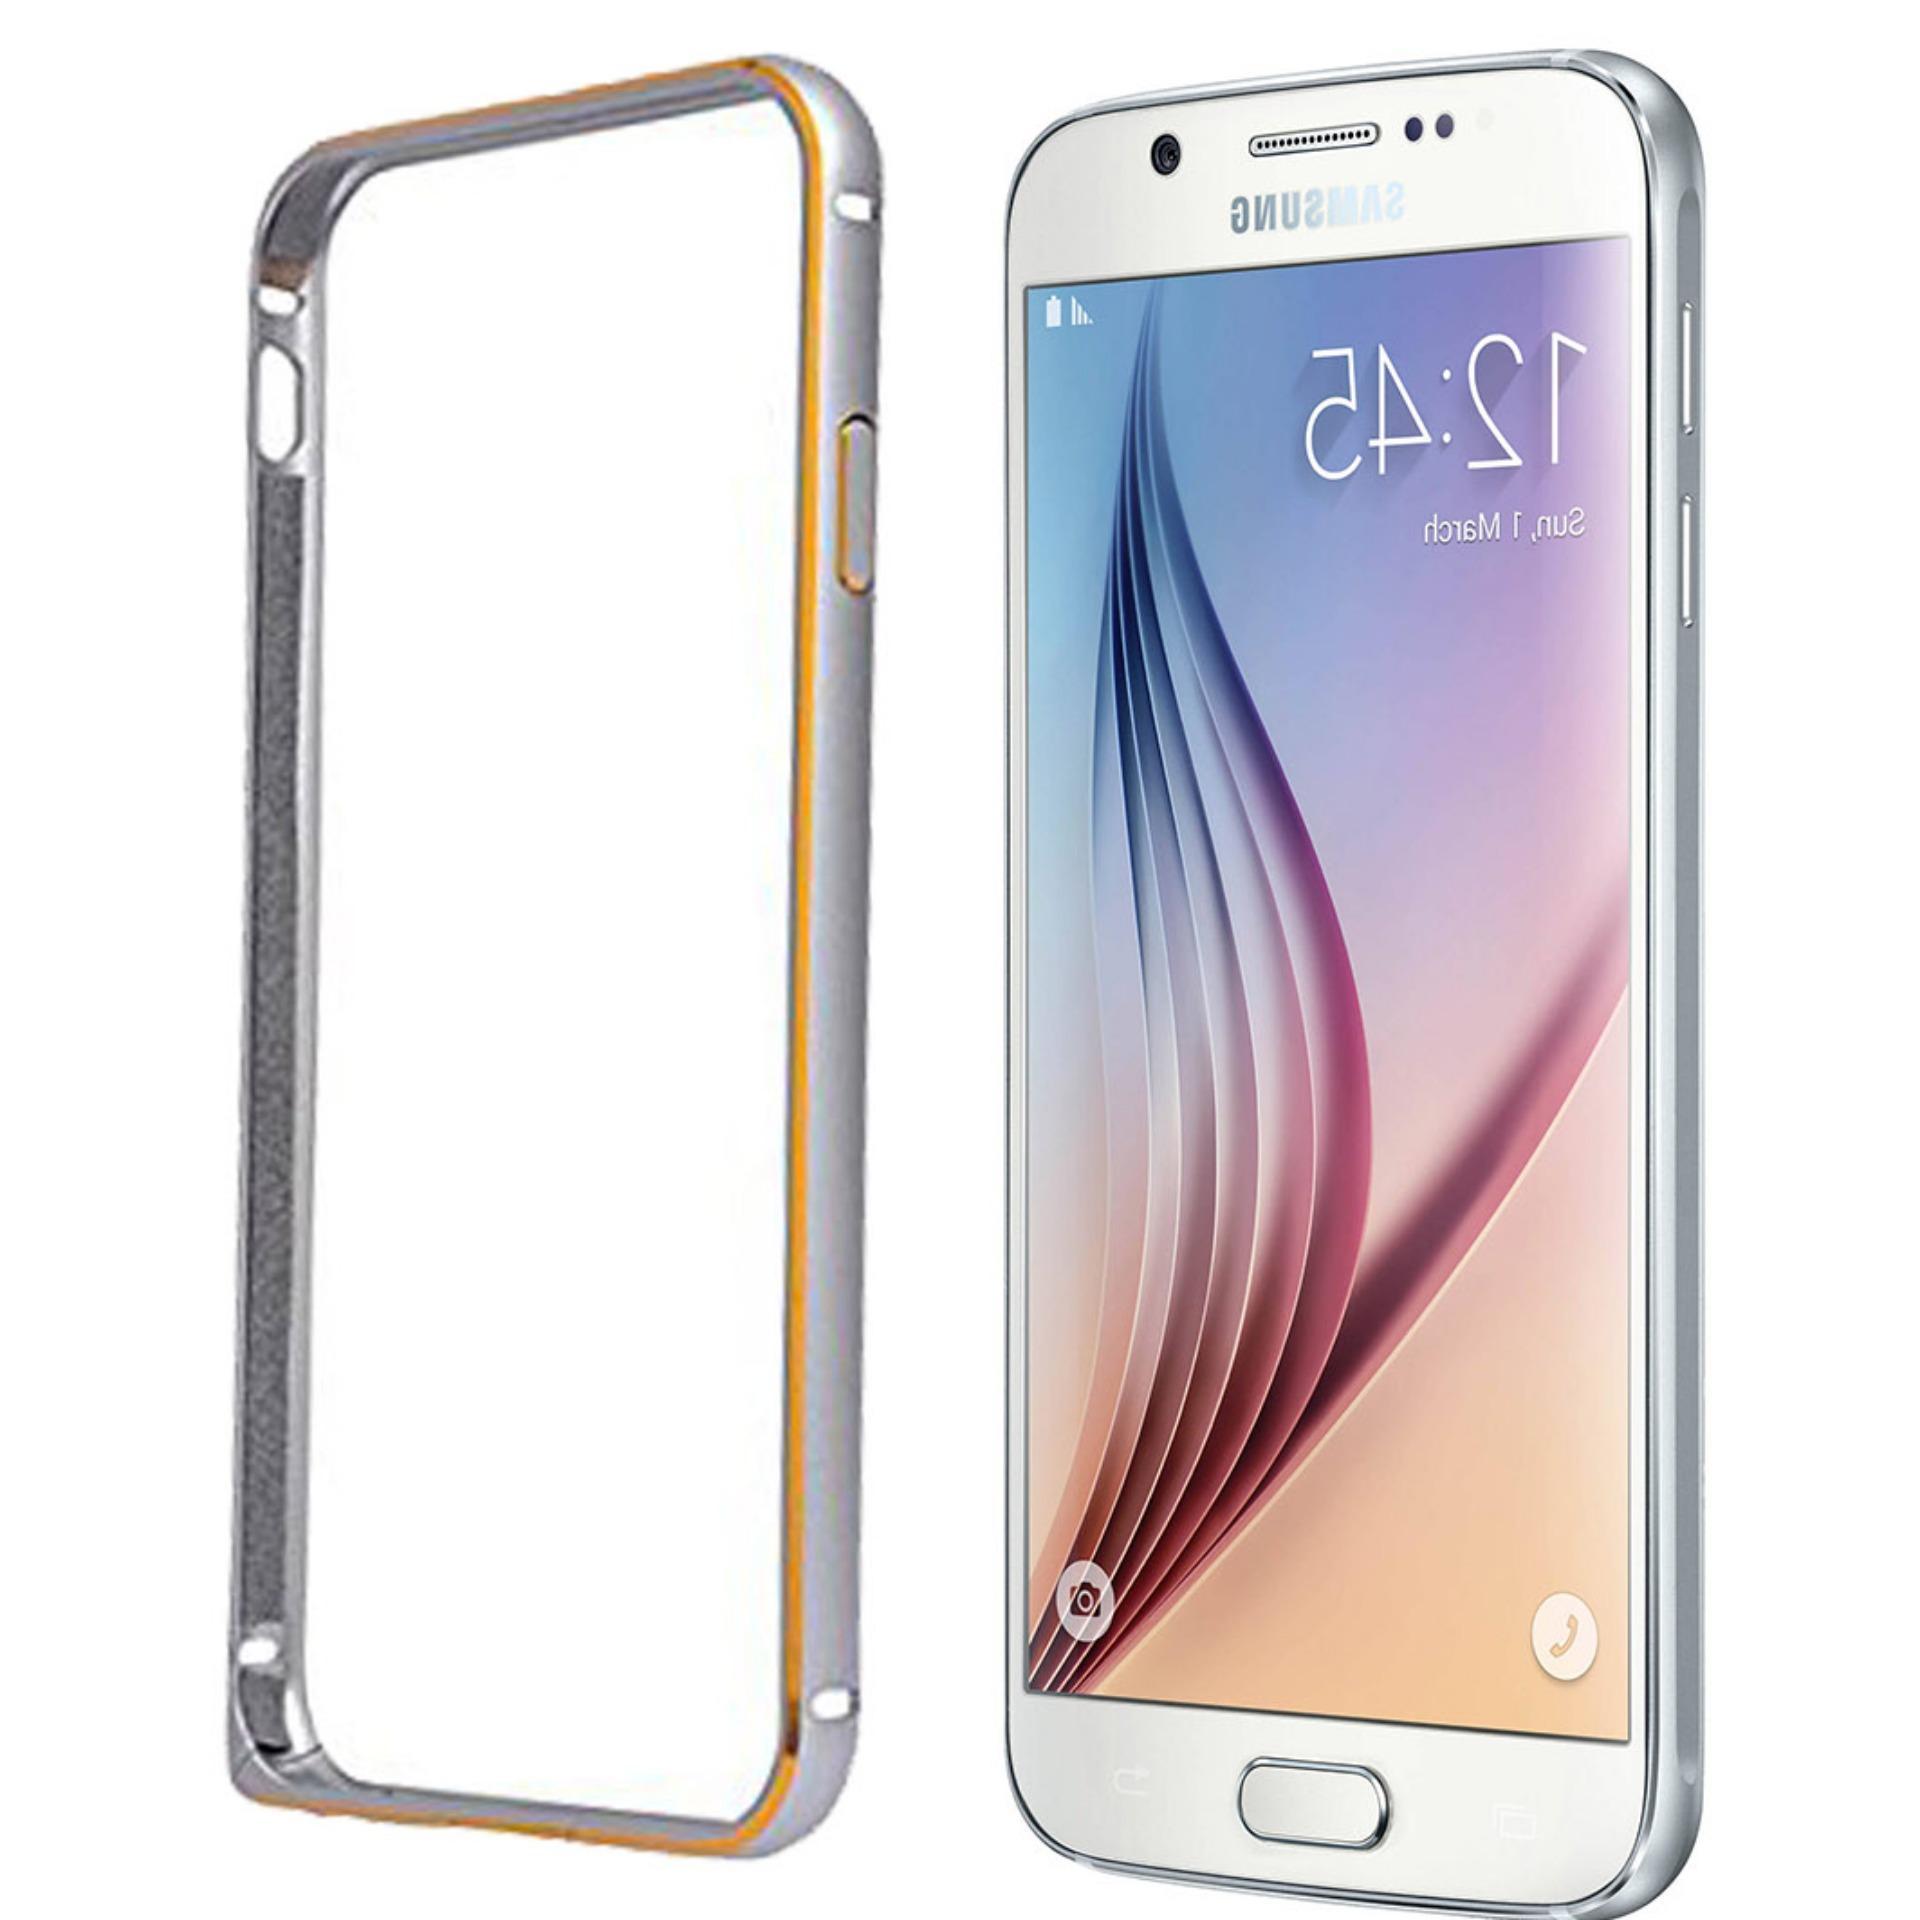 Cek Harga Baru Aluminium Bumper Stainless Metal Bezel List For Samsung Galaxy A5 A500f Lte 16gb Hitam S6 Flat G920 4g